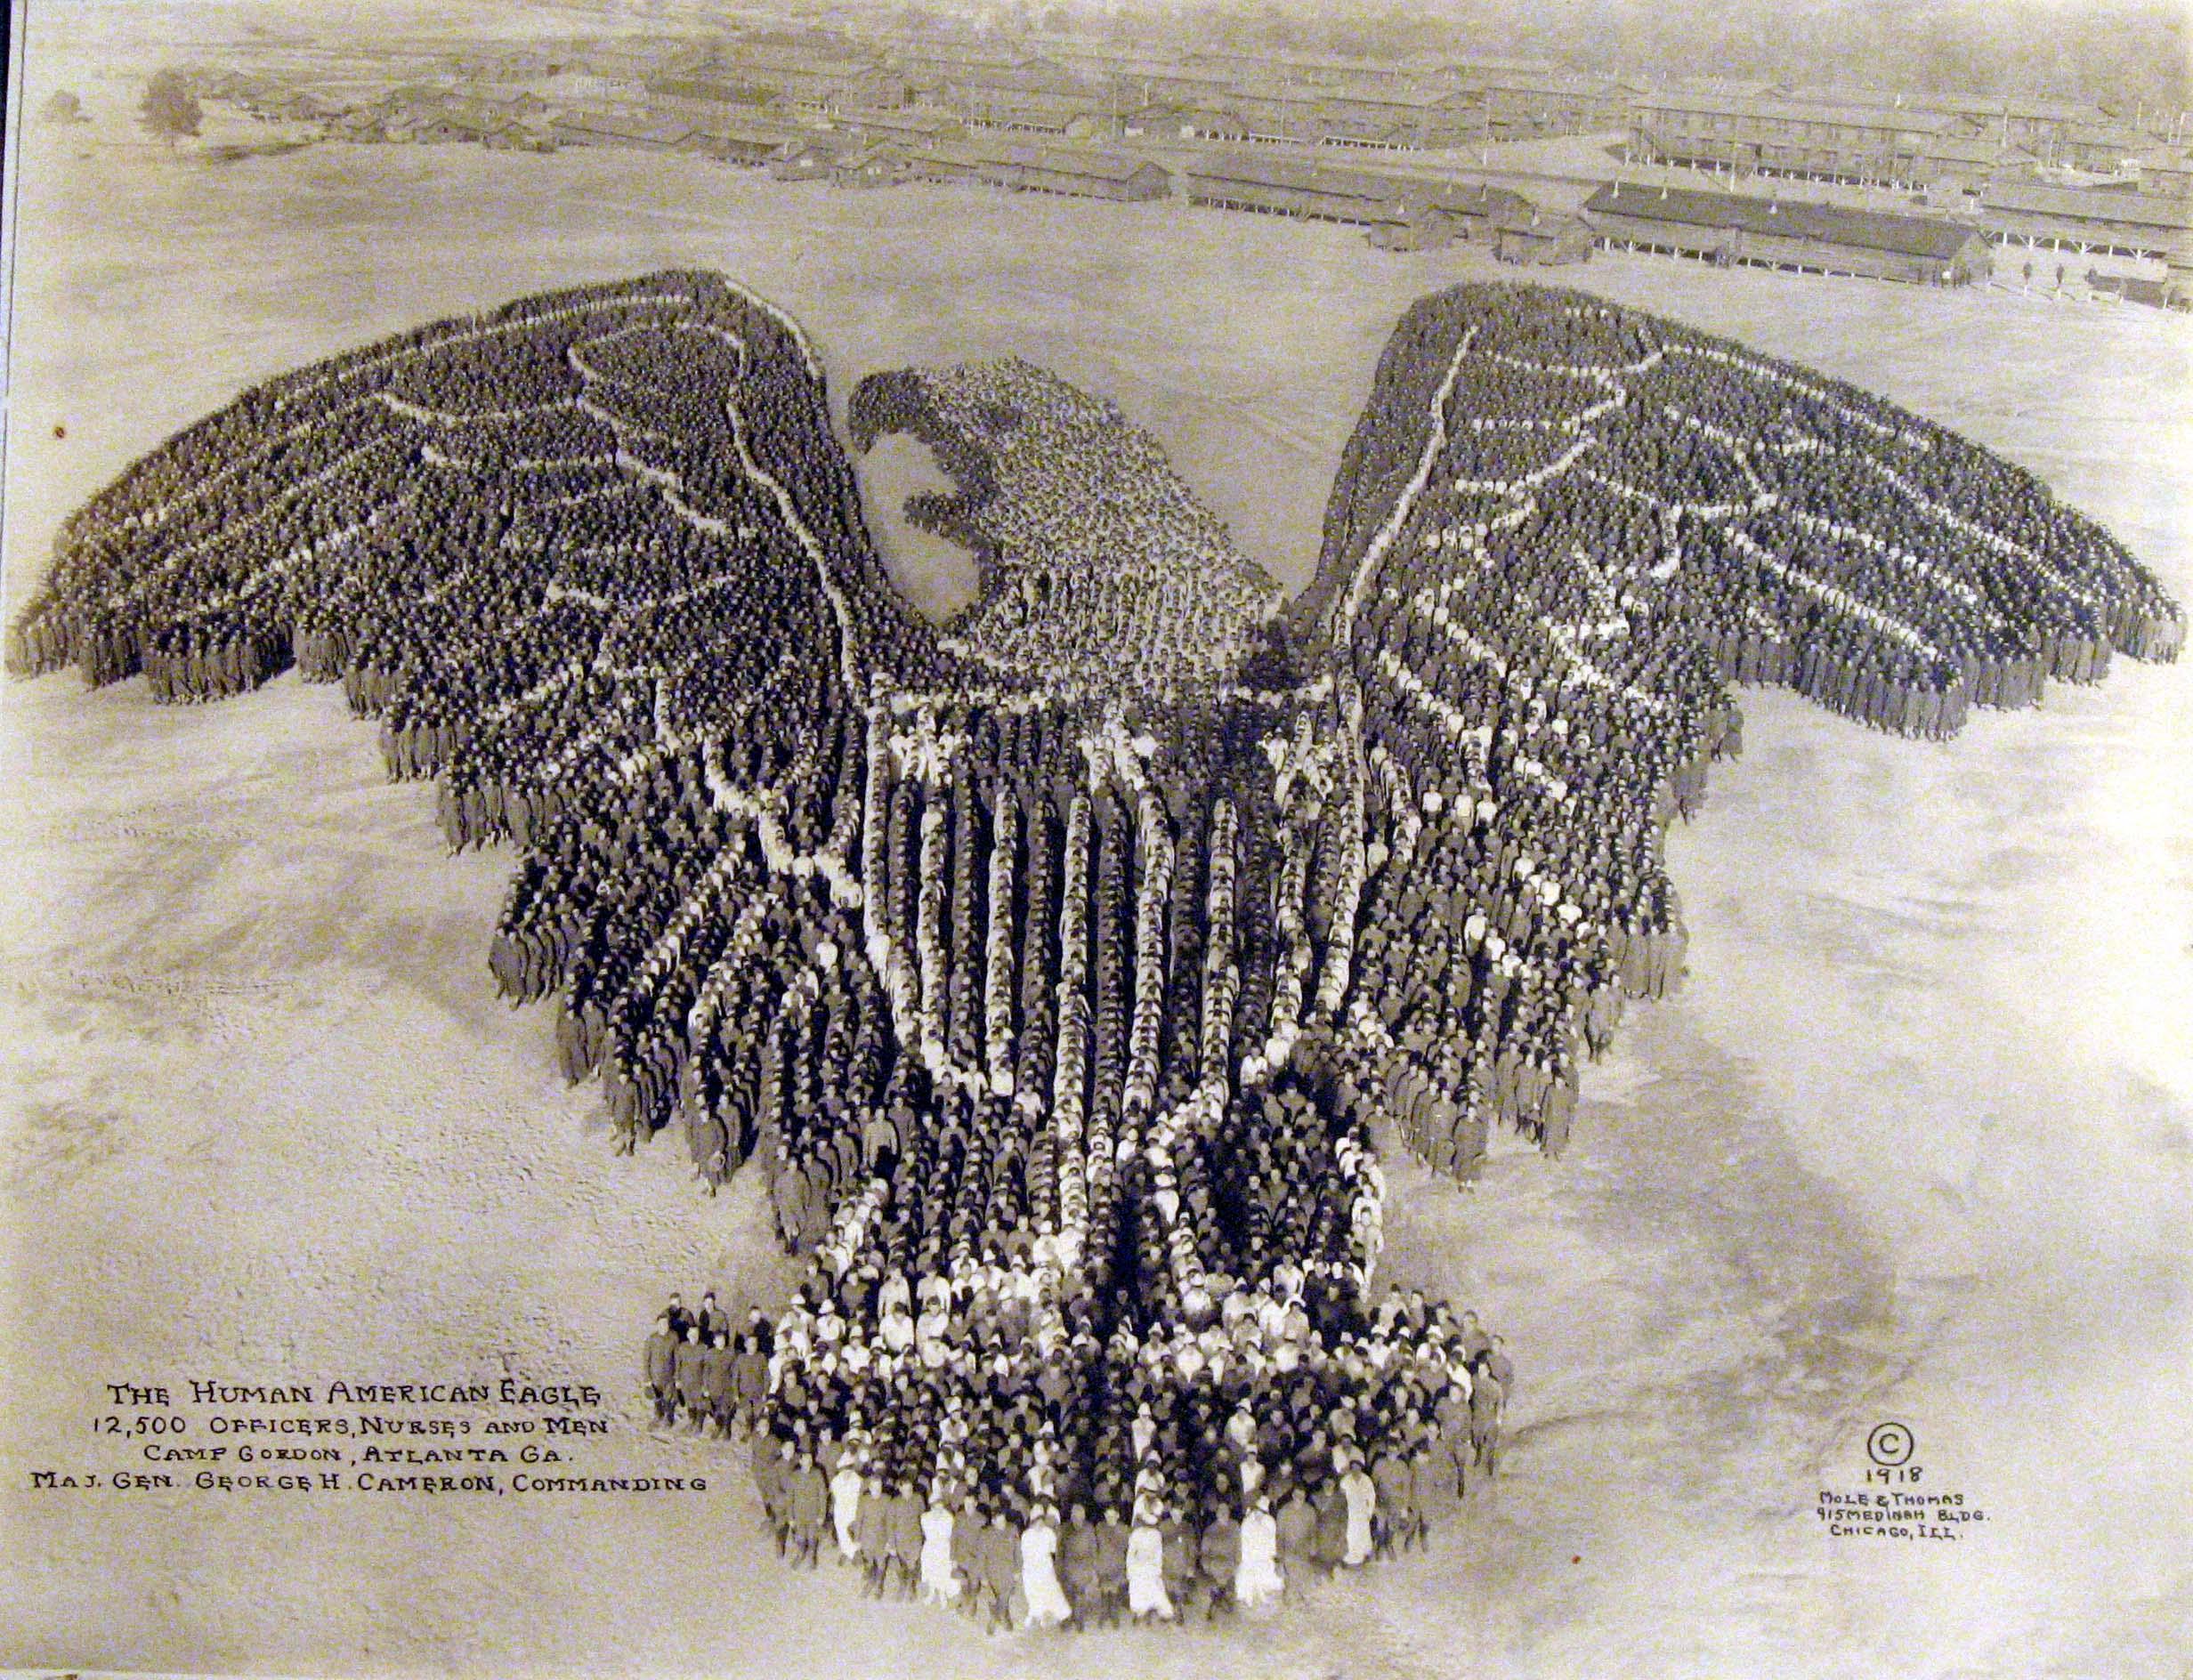 The Human American Eagle, 1918